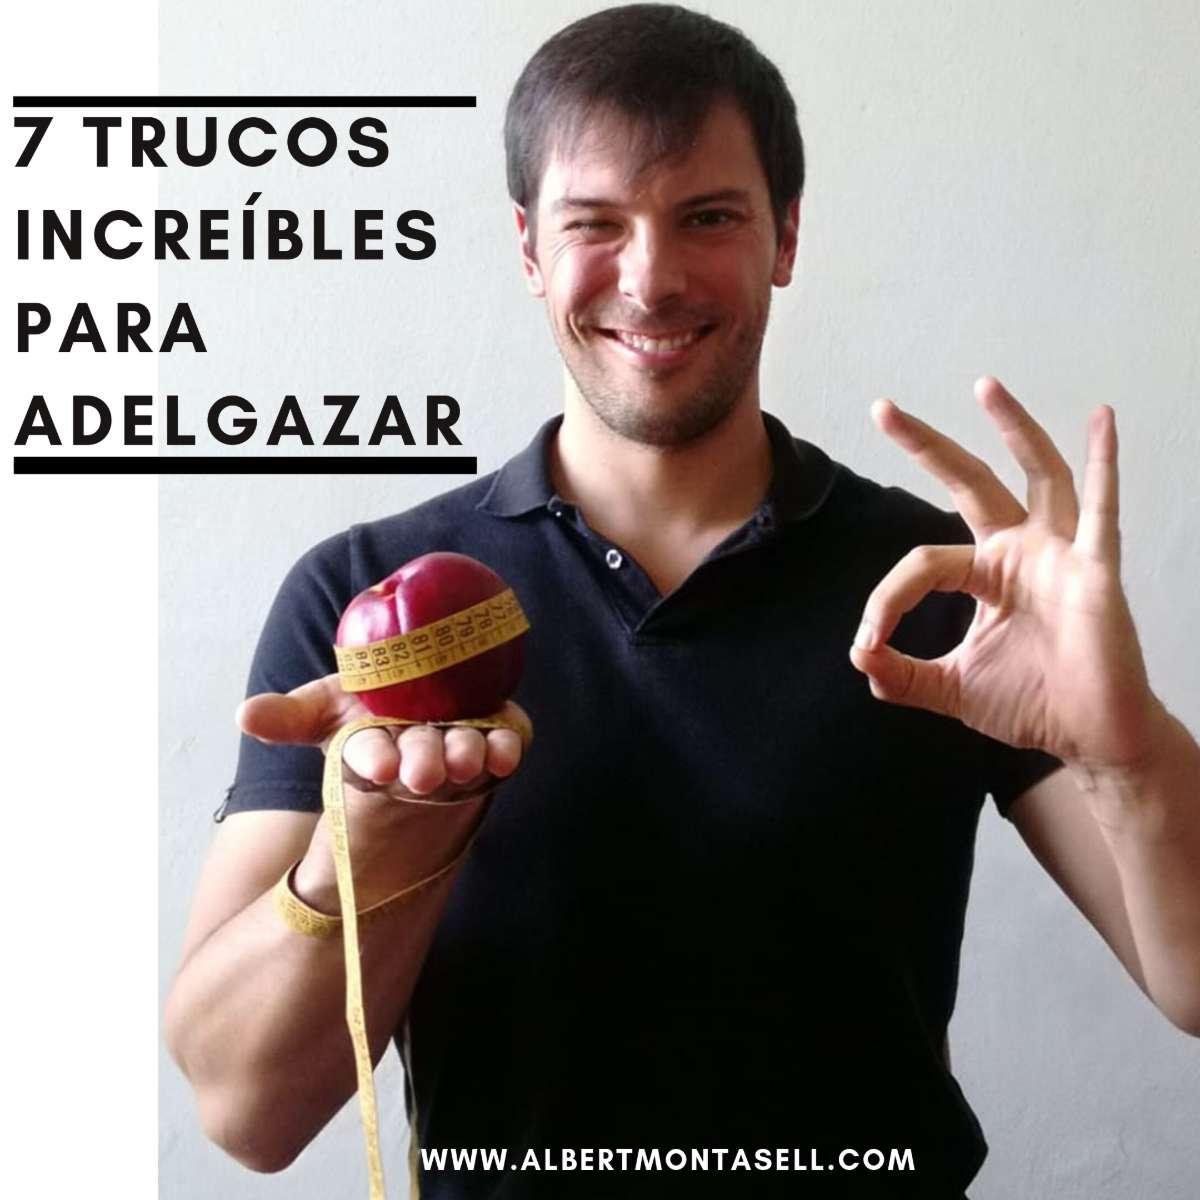 albert montasell enseña una manzana envuelta con una cinta metrica